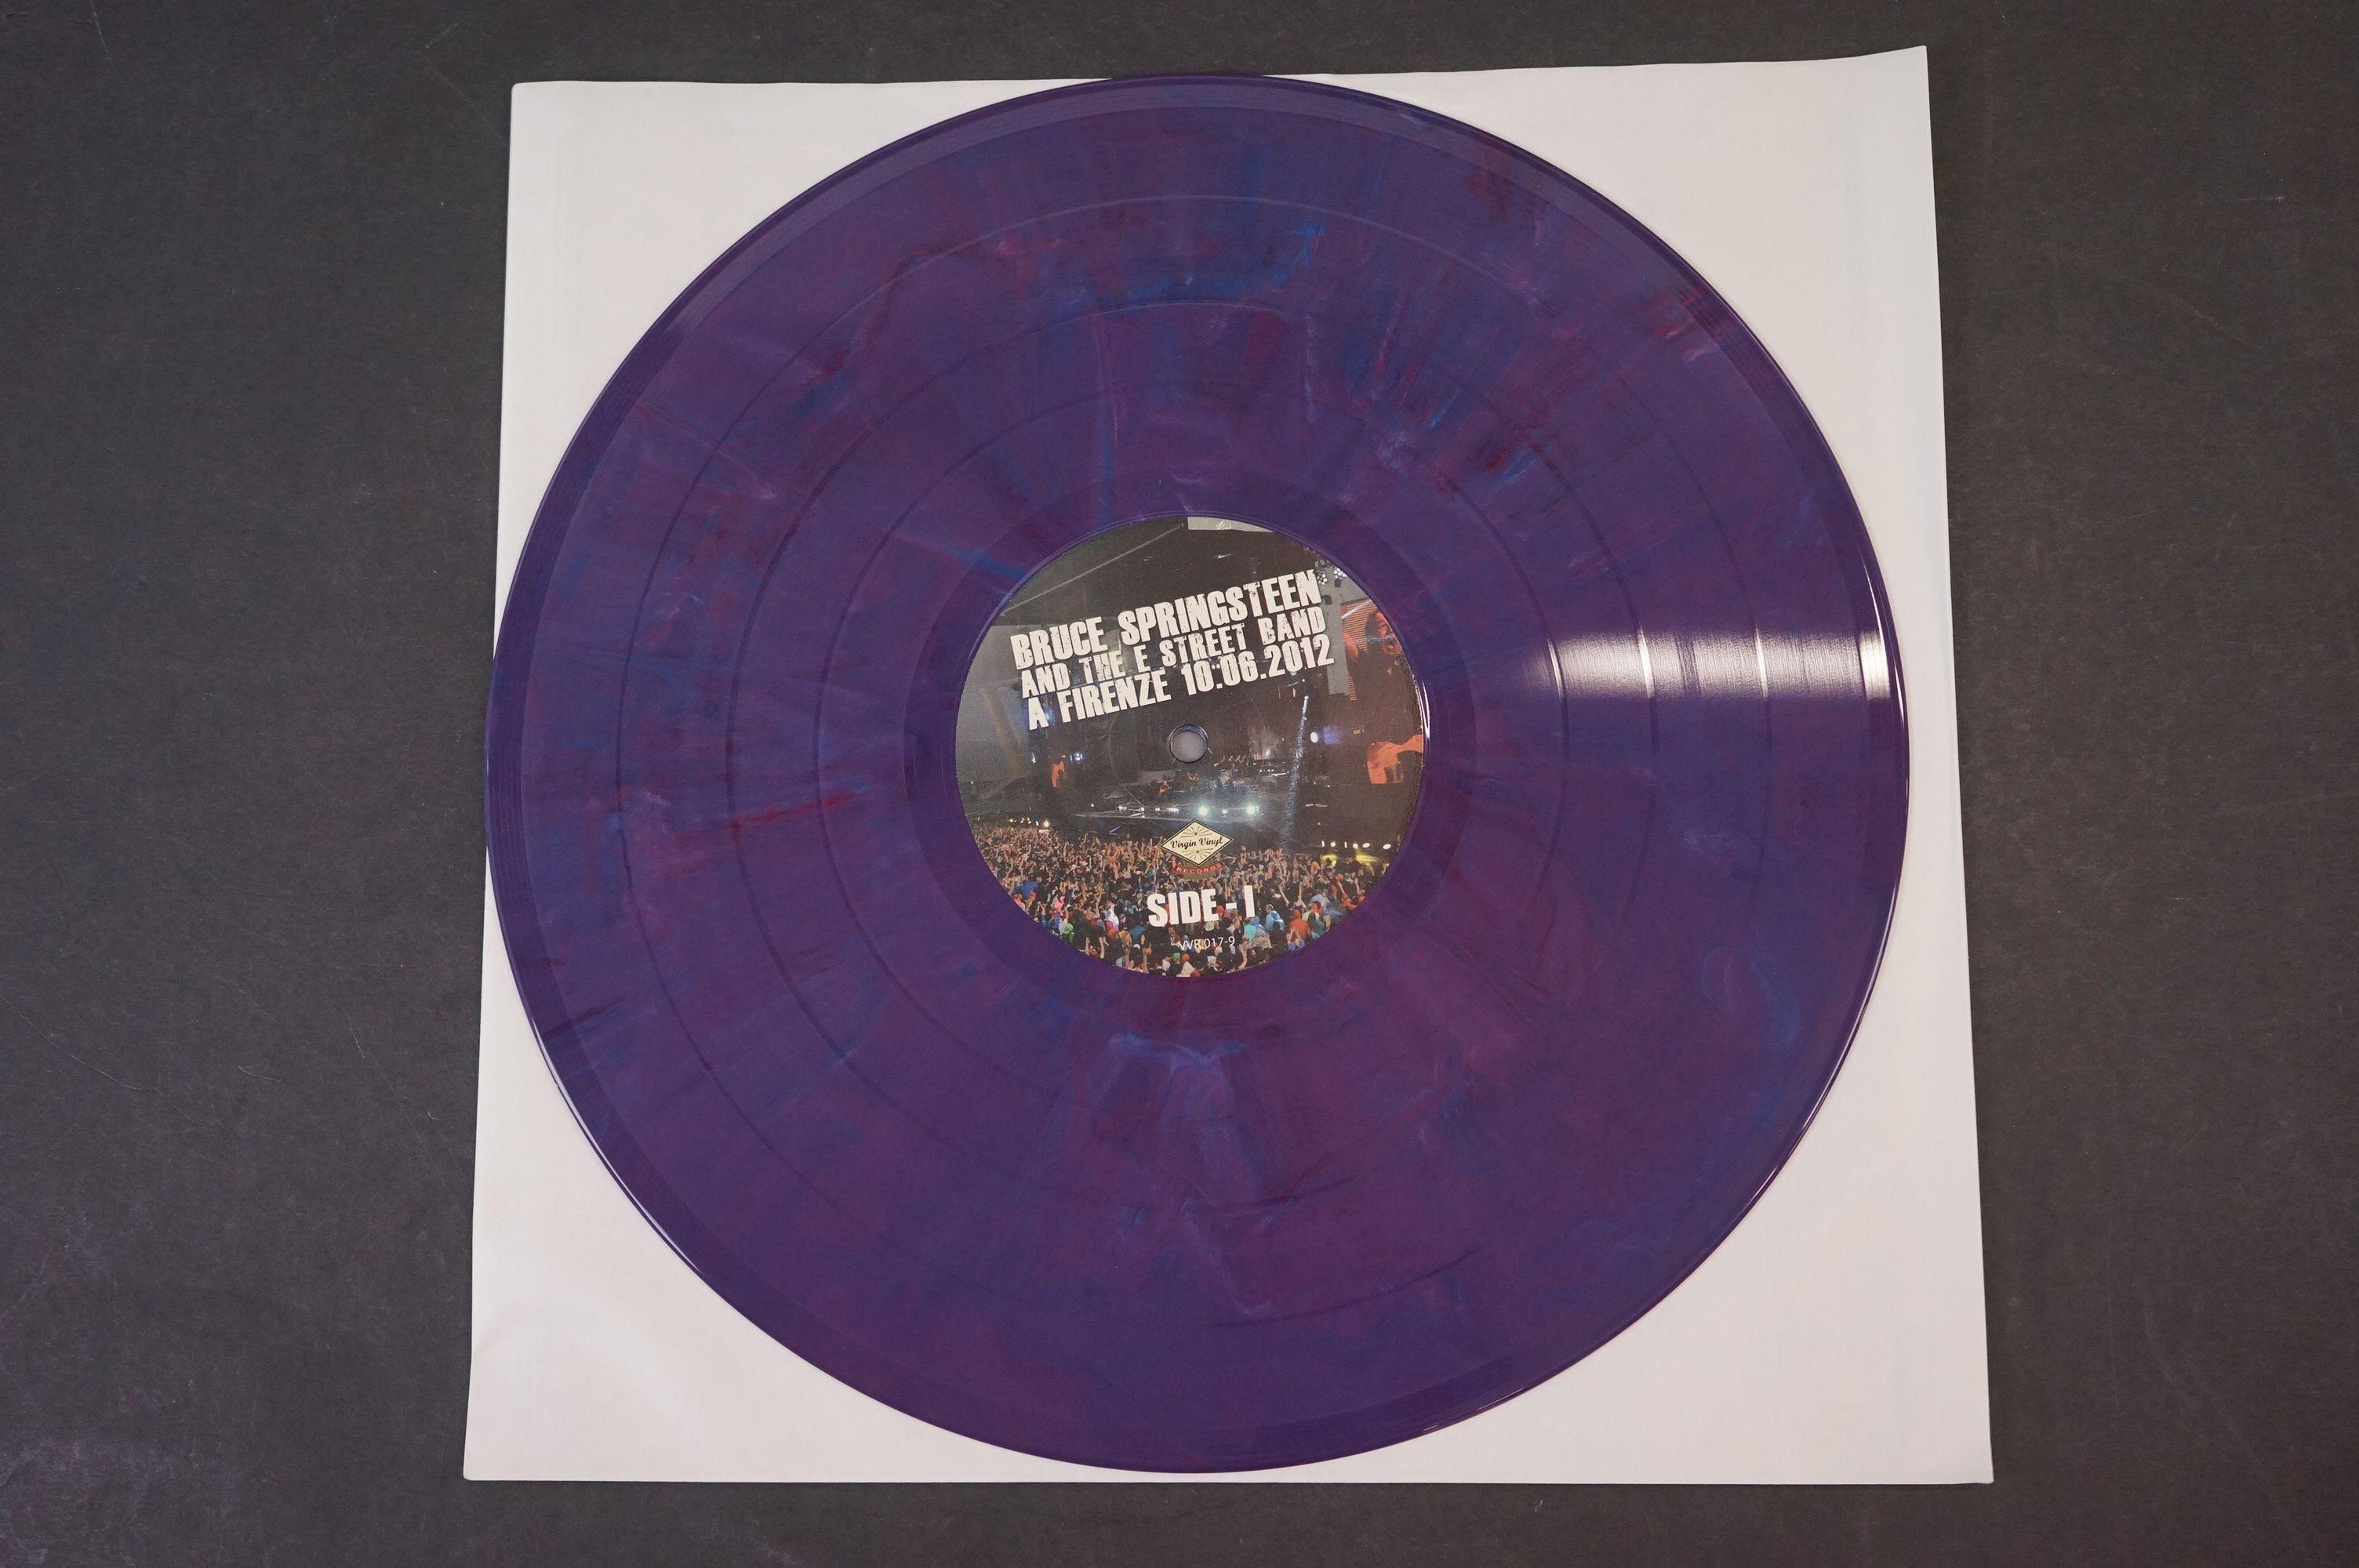 Vinyl - ltd edn Bruce Springsteen and The E Street Band A Firenze 10.06.2012 5 LP 3 CD 1 DVD heavy - Image 8 of 10